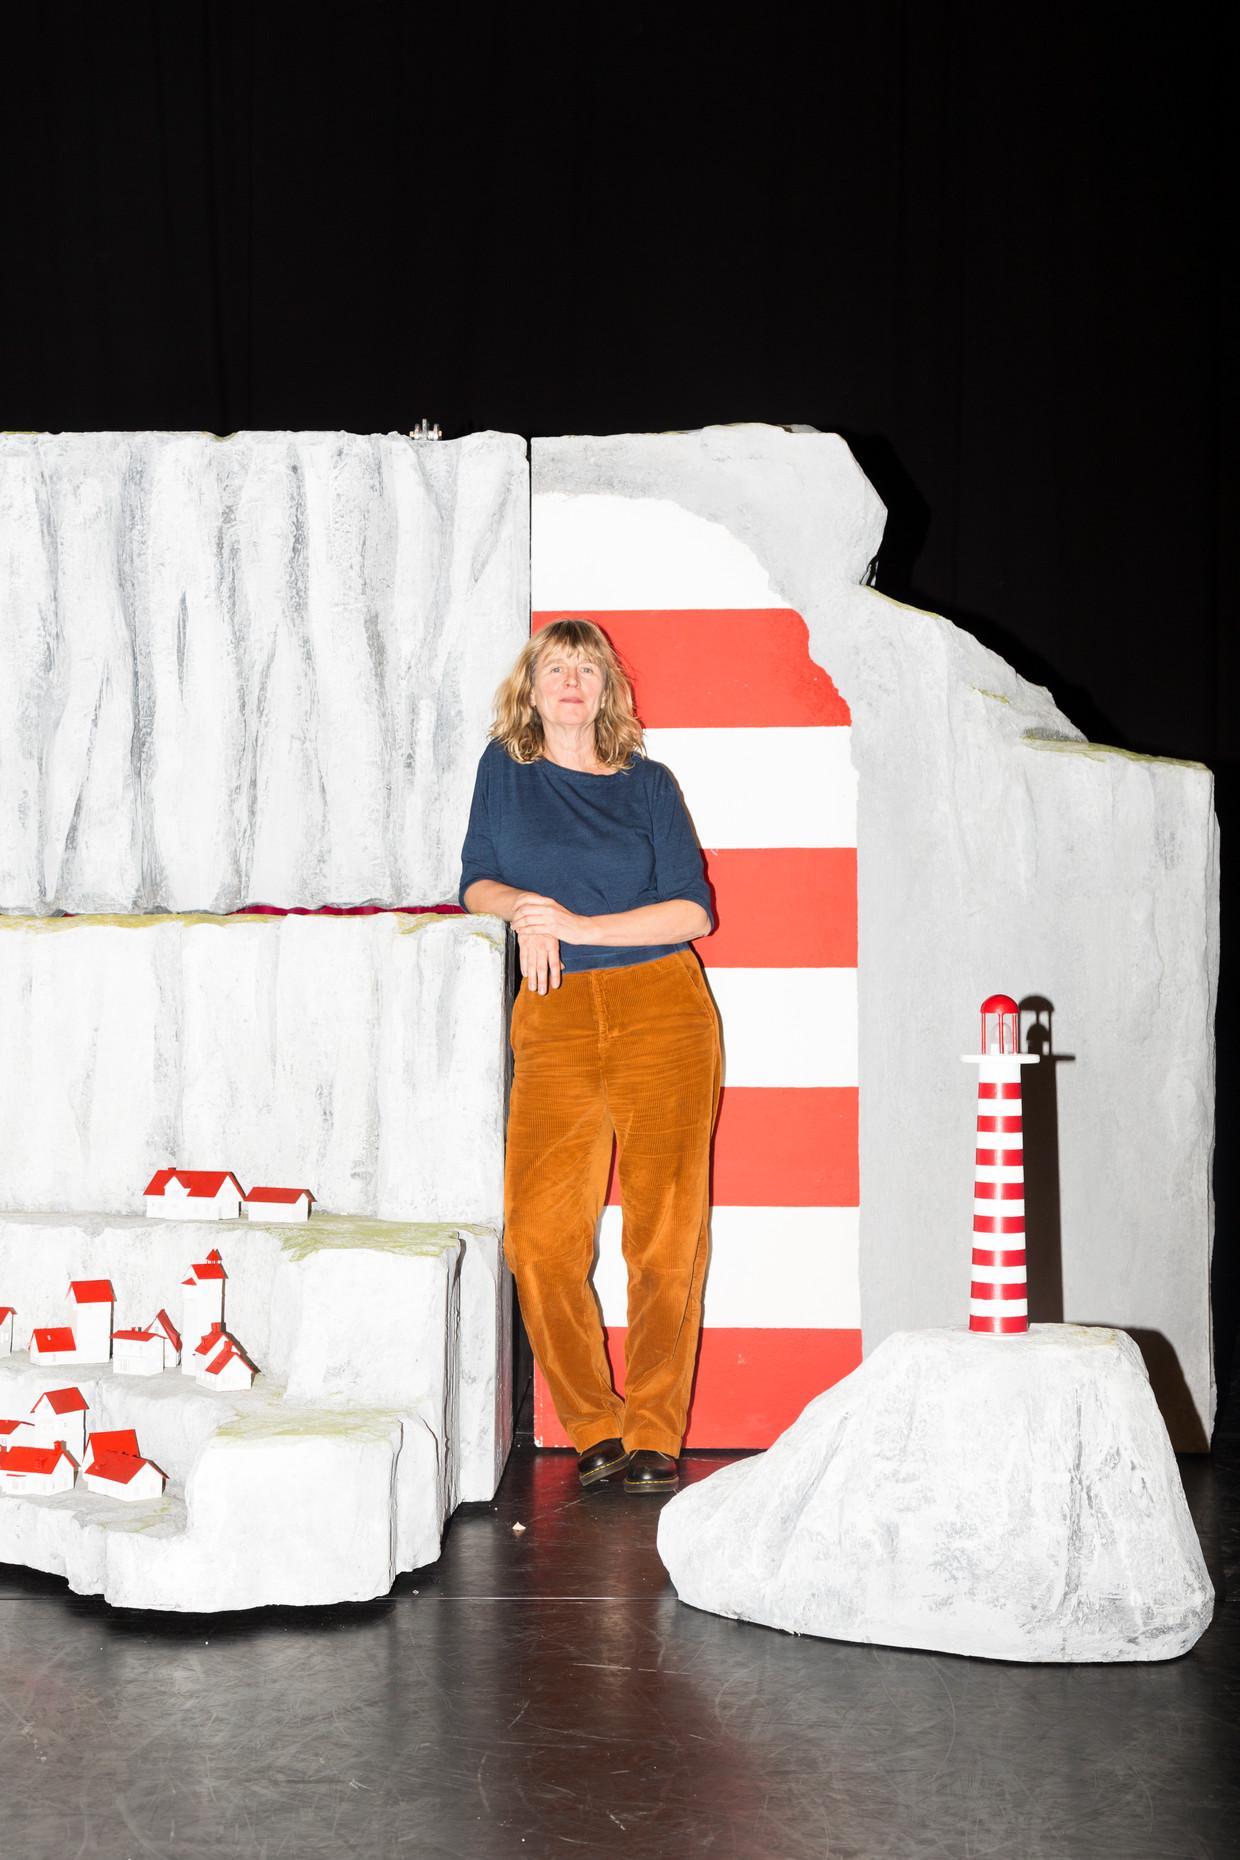 Theaterdecor van Lampje met ontwerper Sanne Danz in het Maastheater.